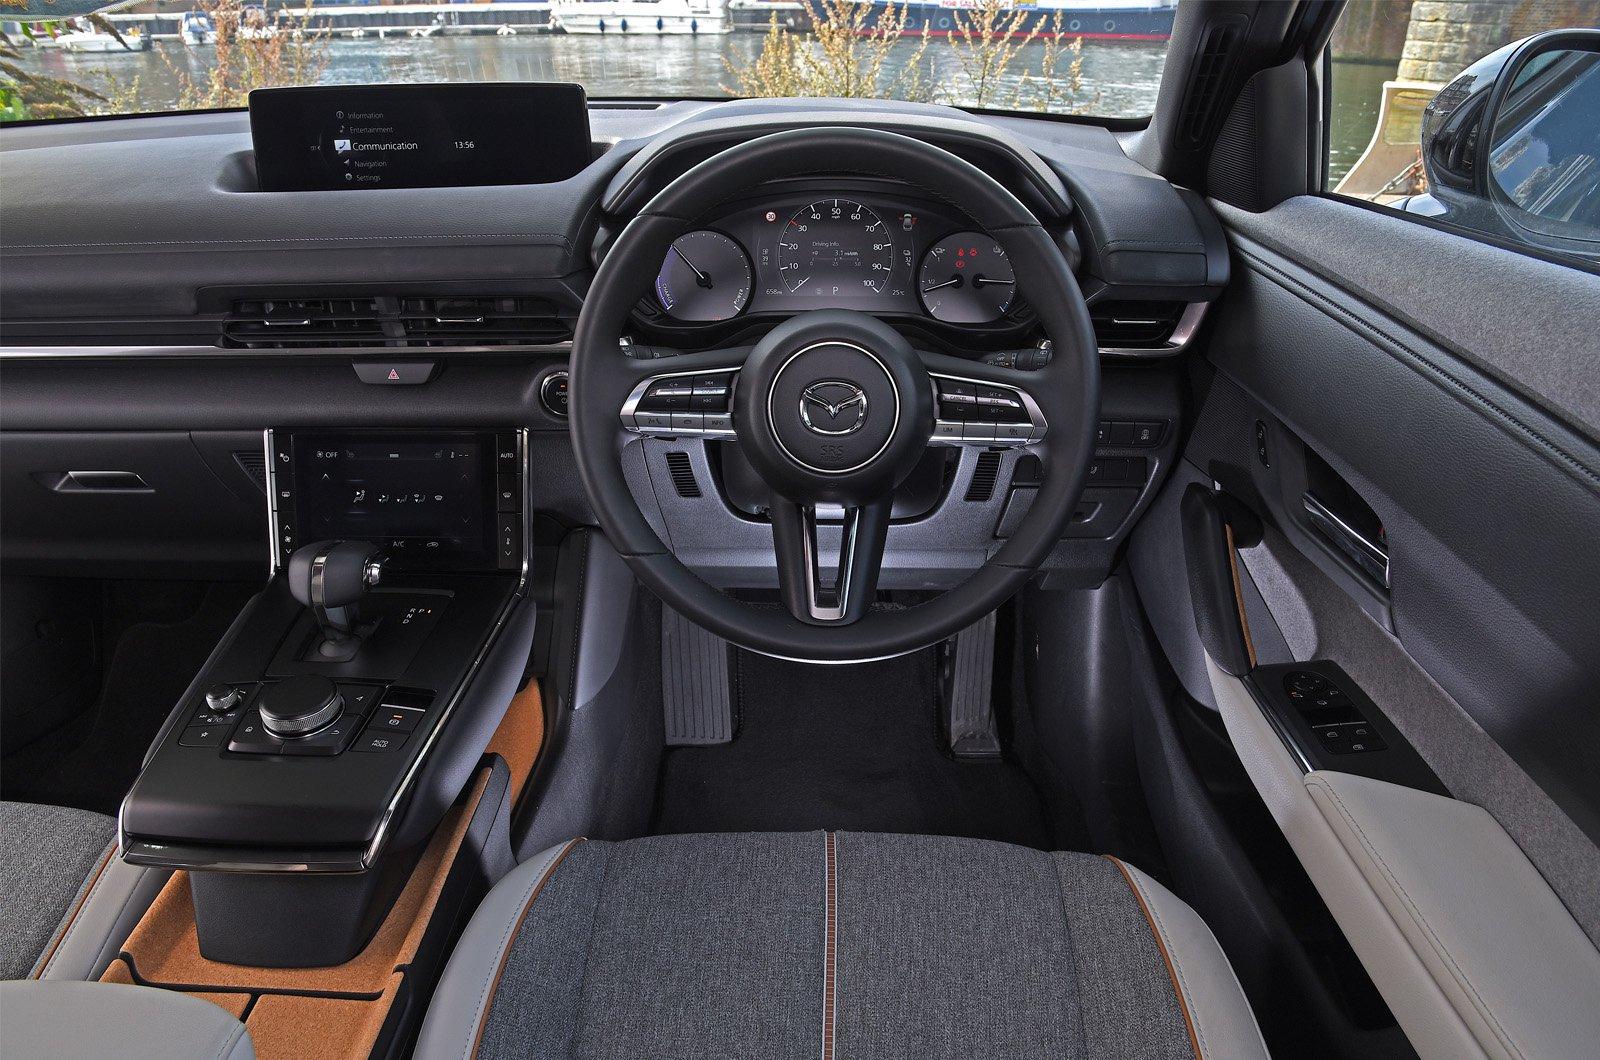 MX-30 long-term interior